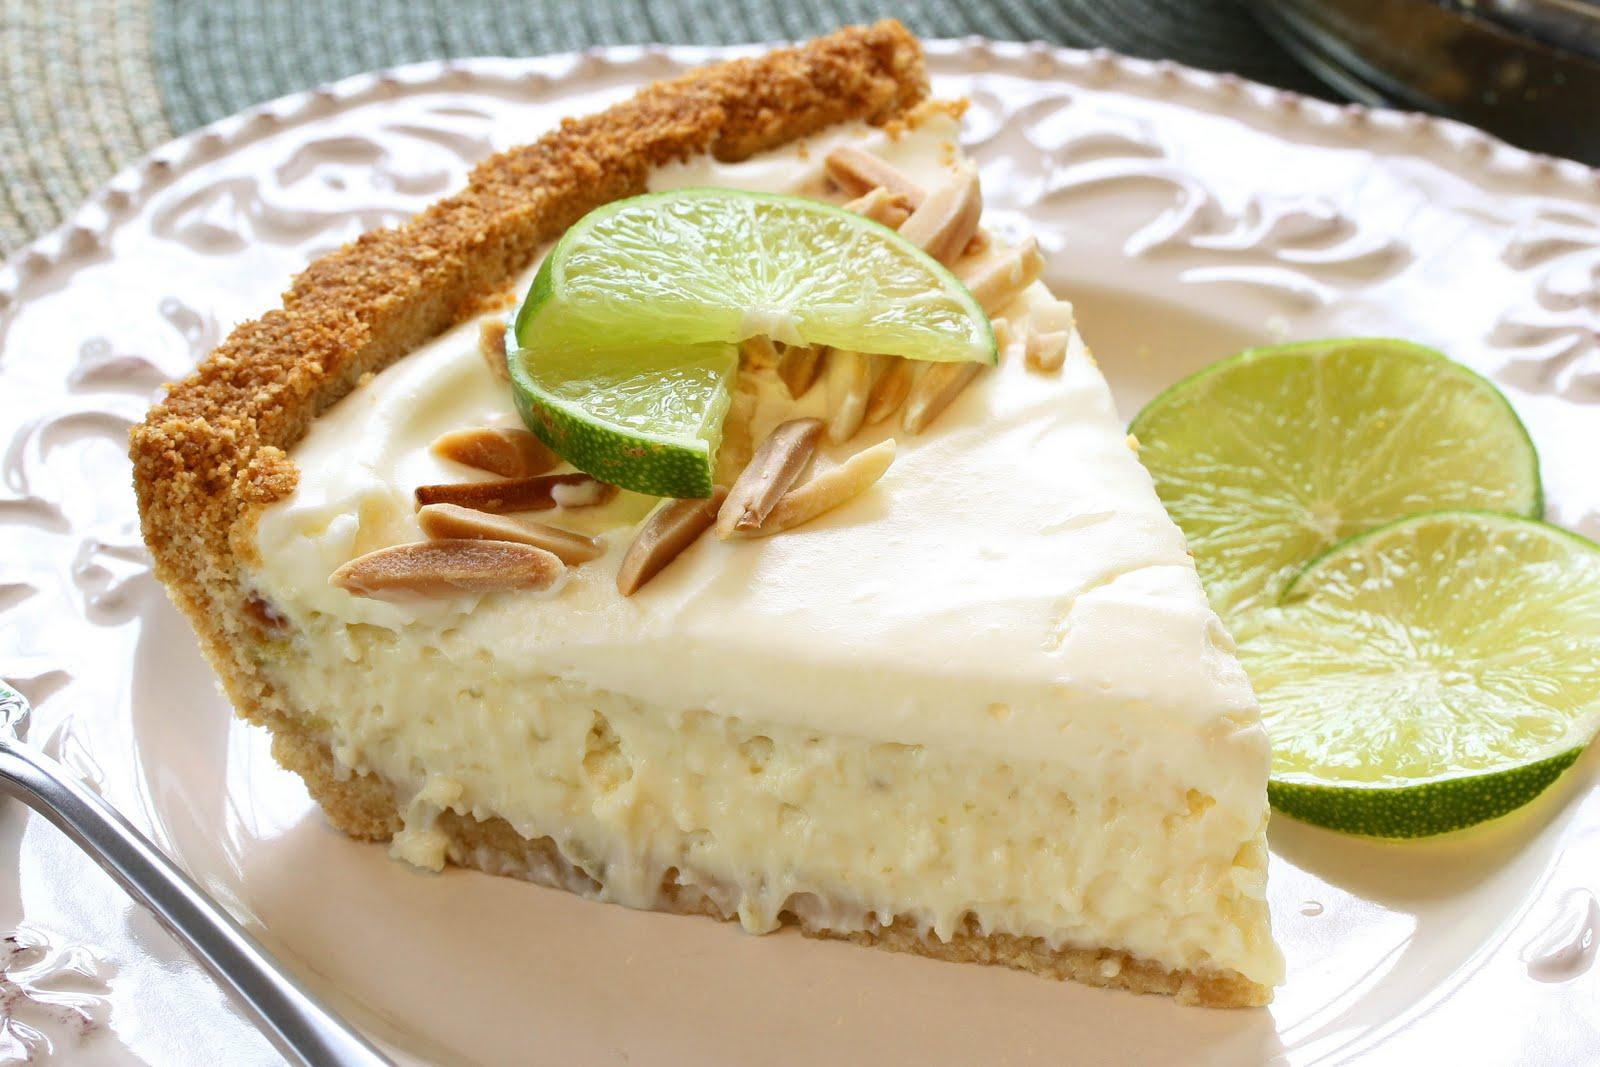 Pie No. 23 - Marshmallow-Almond Key Lime Pie - Saving Room for Dessert